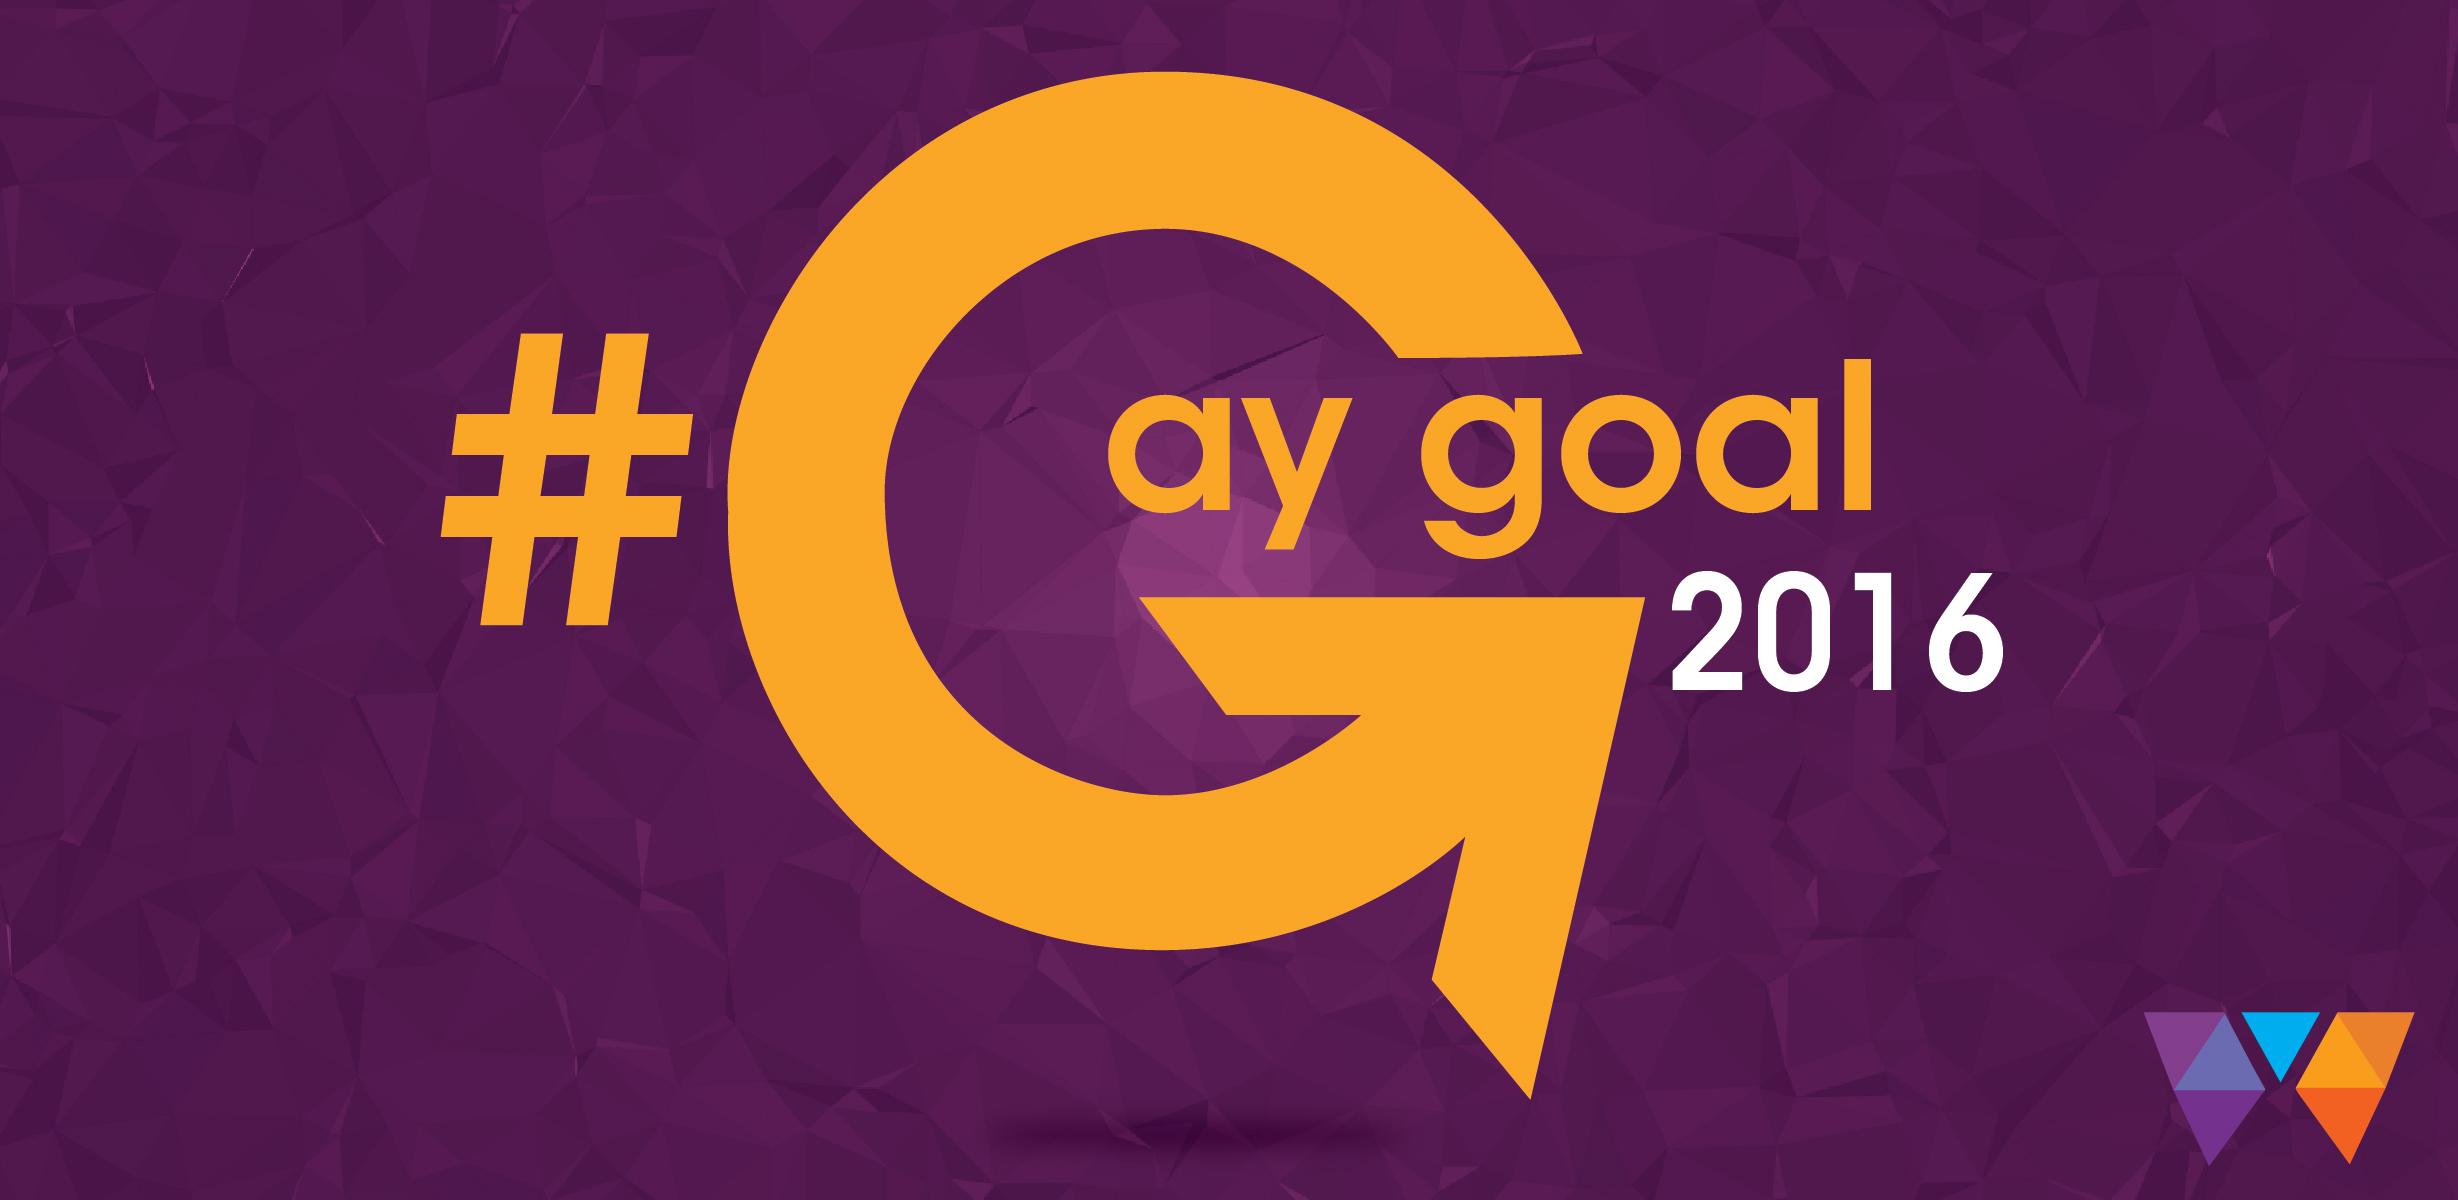 #GayGoal2016 Watermark